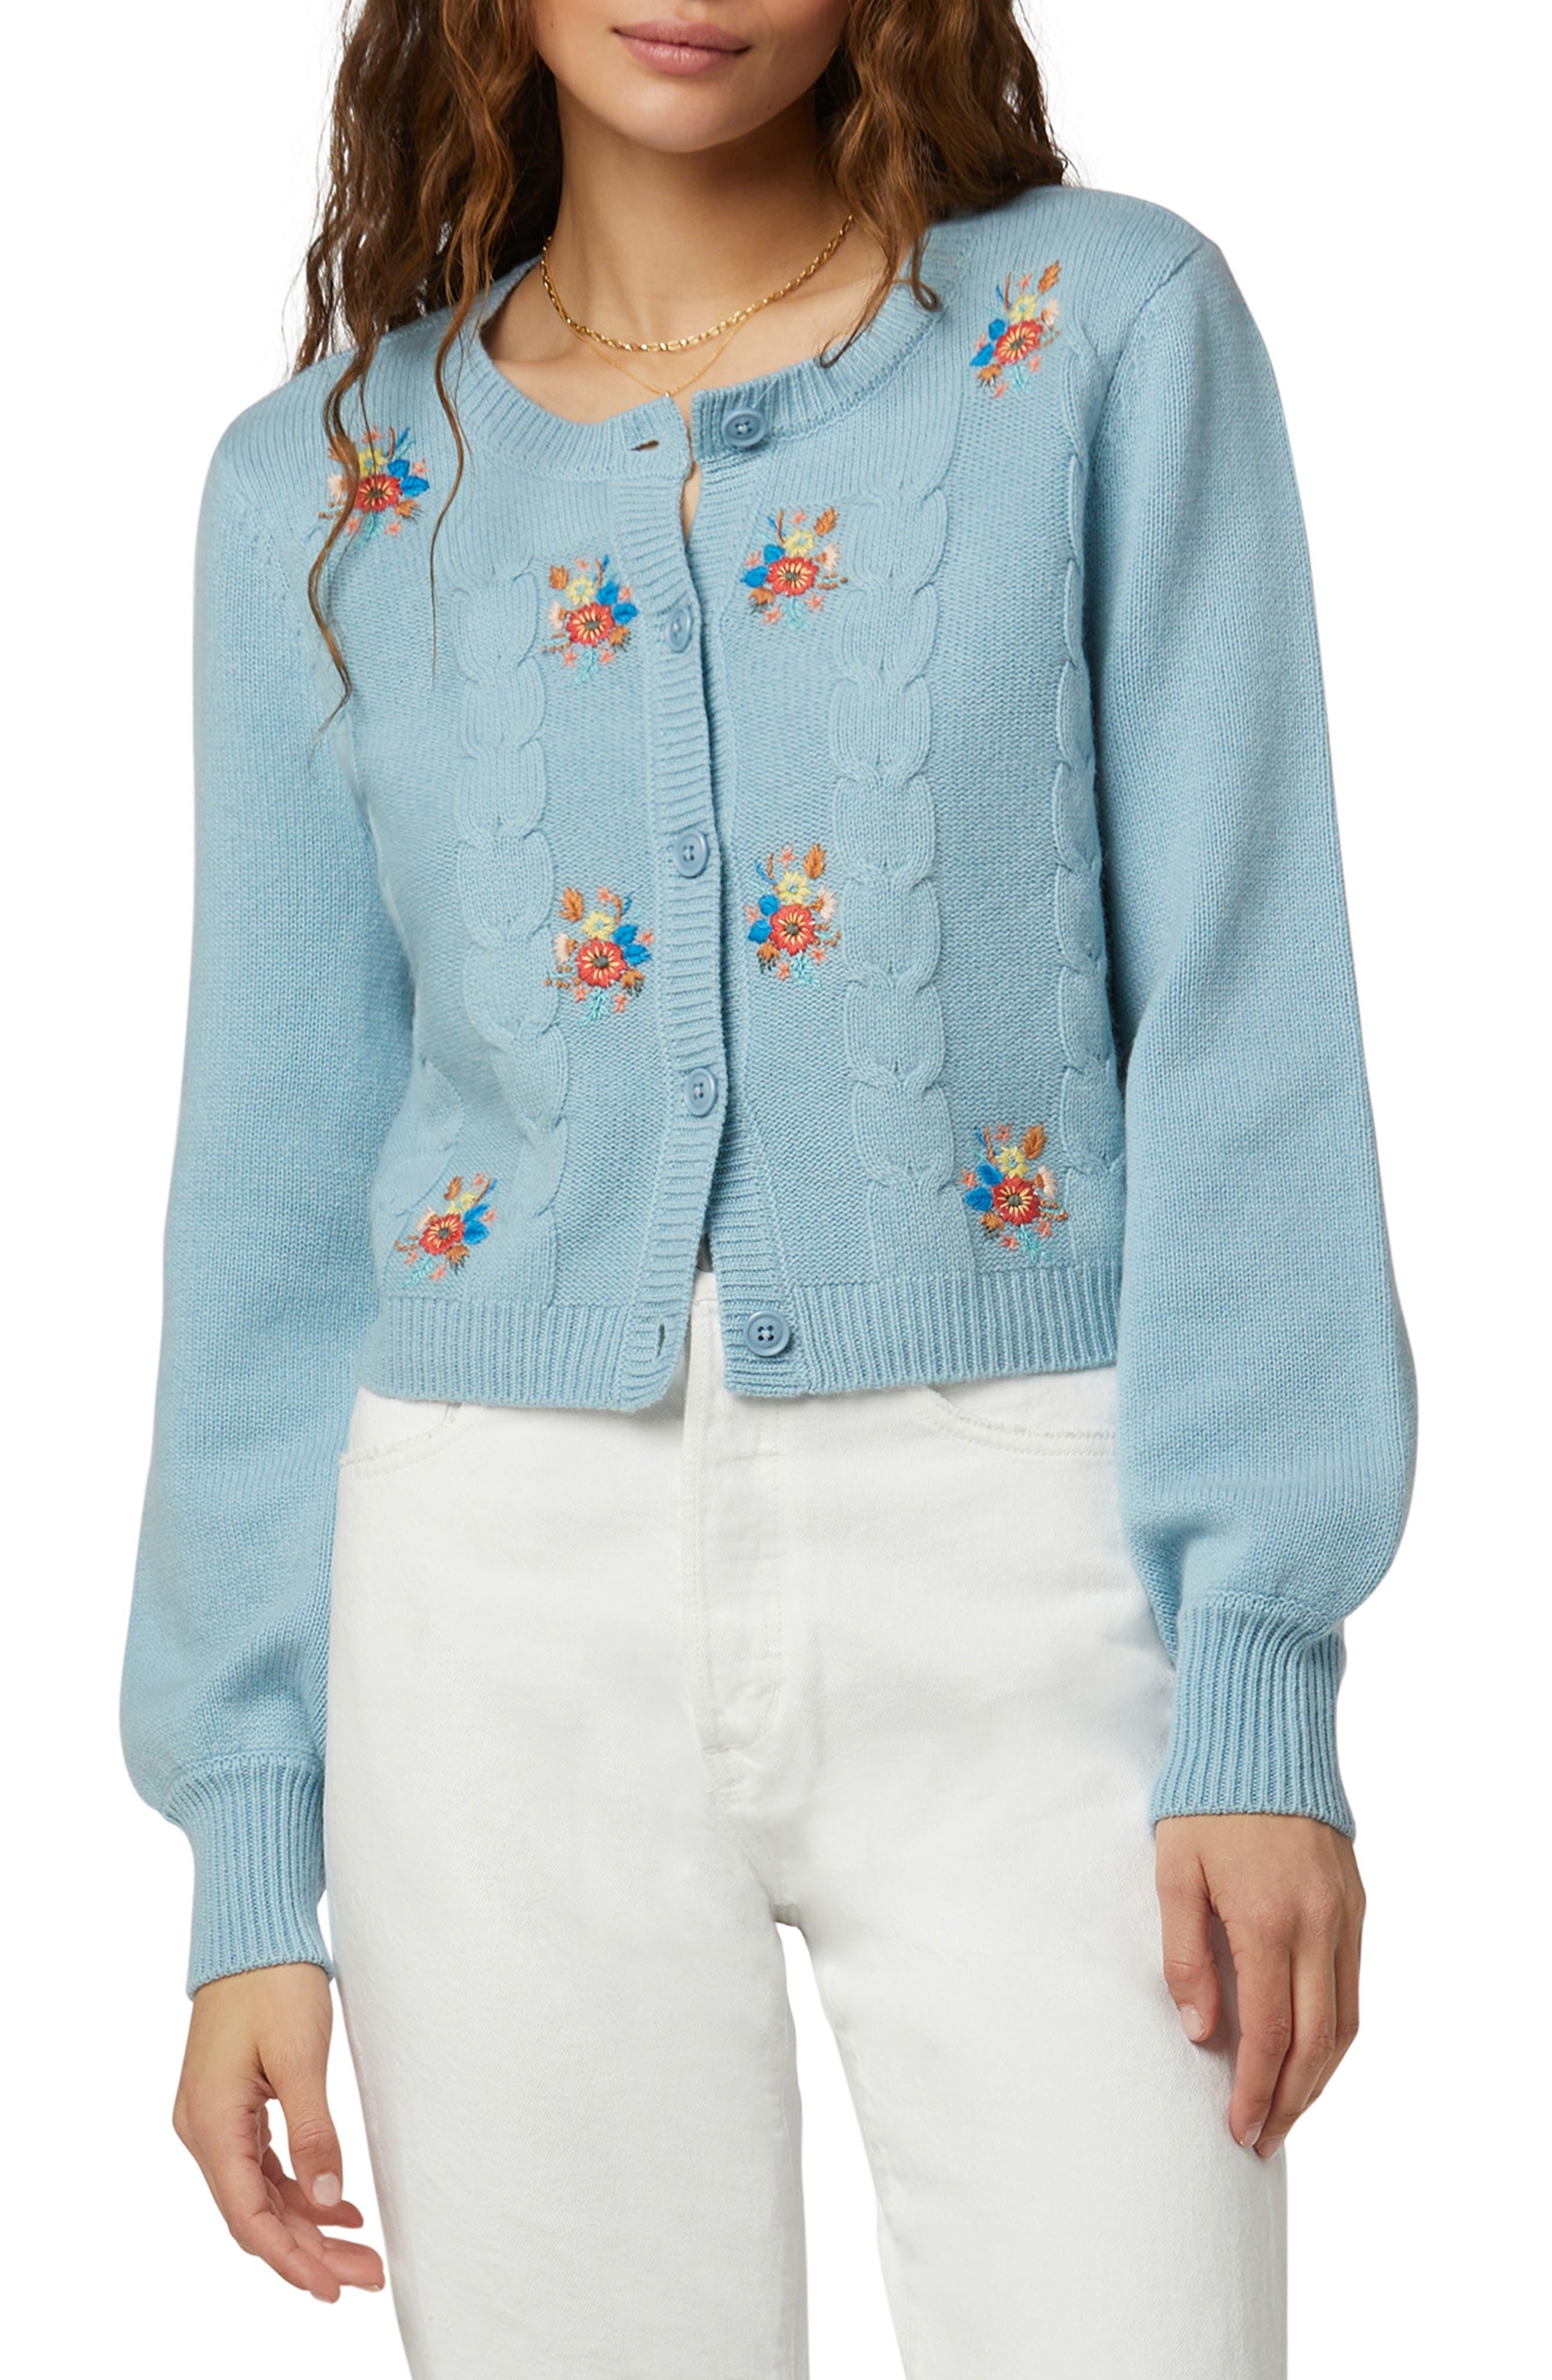 Mimi Nana Embroidered Wool & Cashmere Cardigan